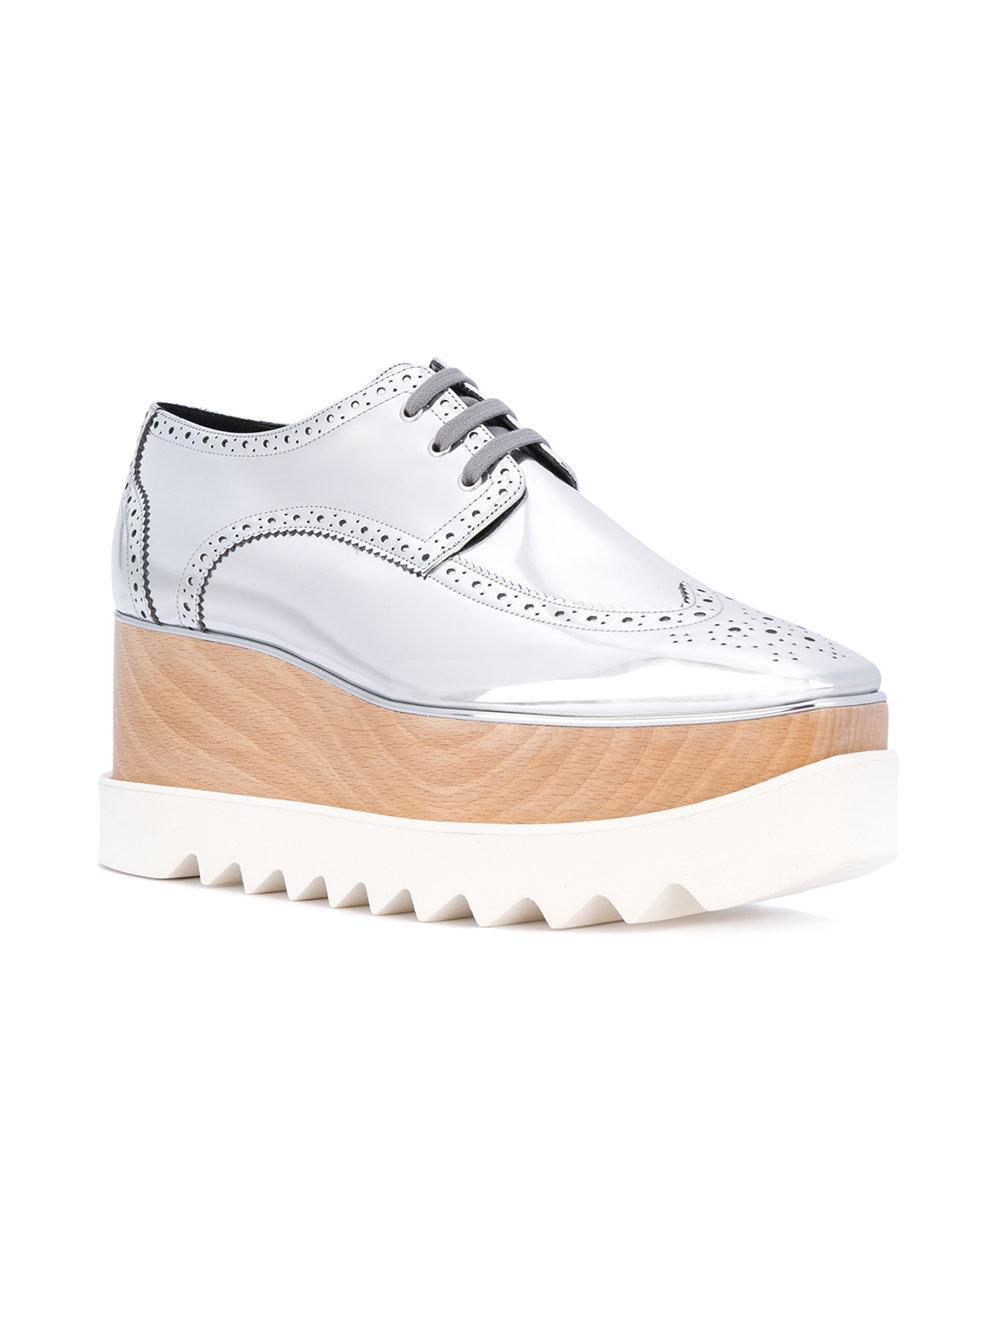 0c3306c2e3c0 Lyst - Stella McCartney Metallic Elyse Shoes in Gray